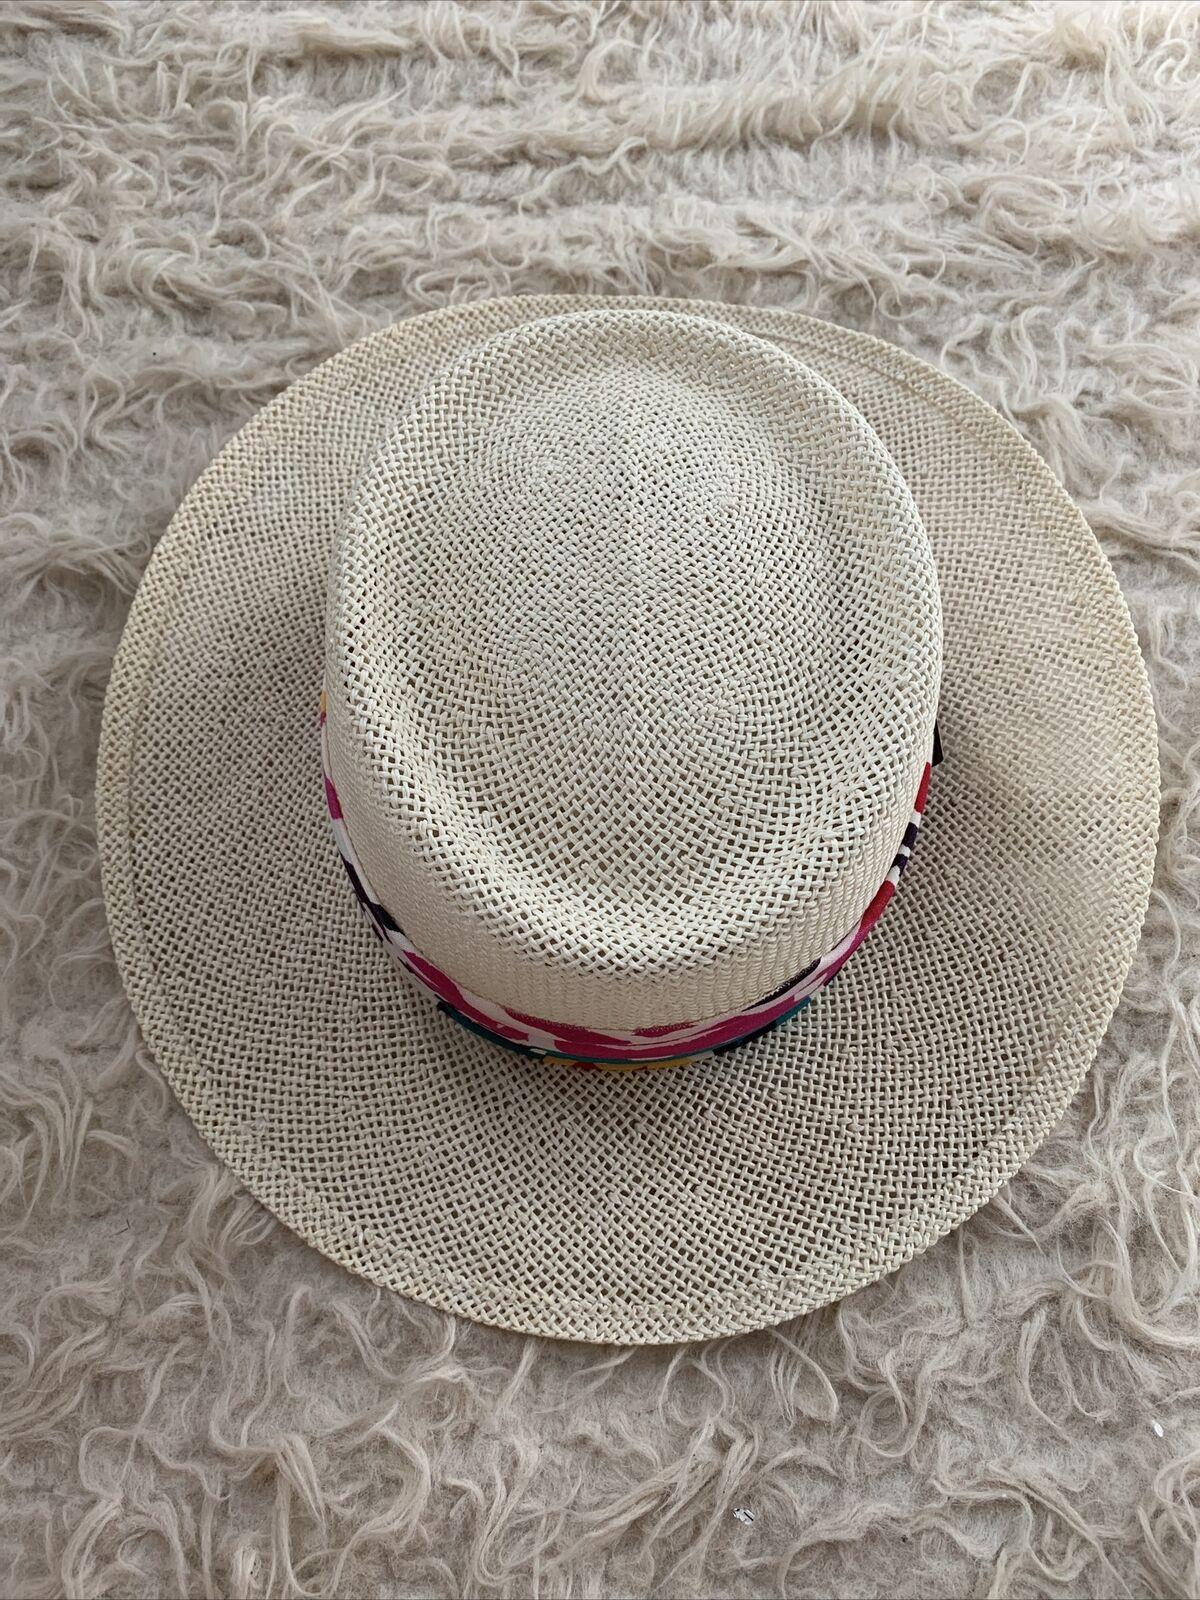 Kangol Straw Hat Golf Vacation Summer O/S Sun Hat - image 1